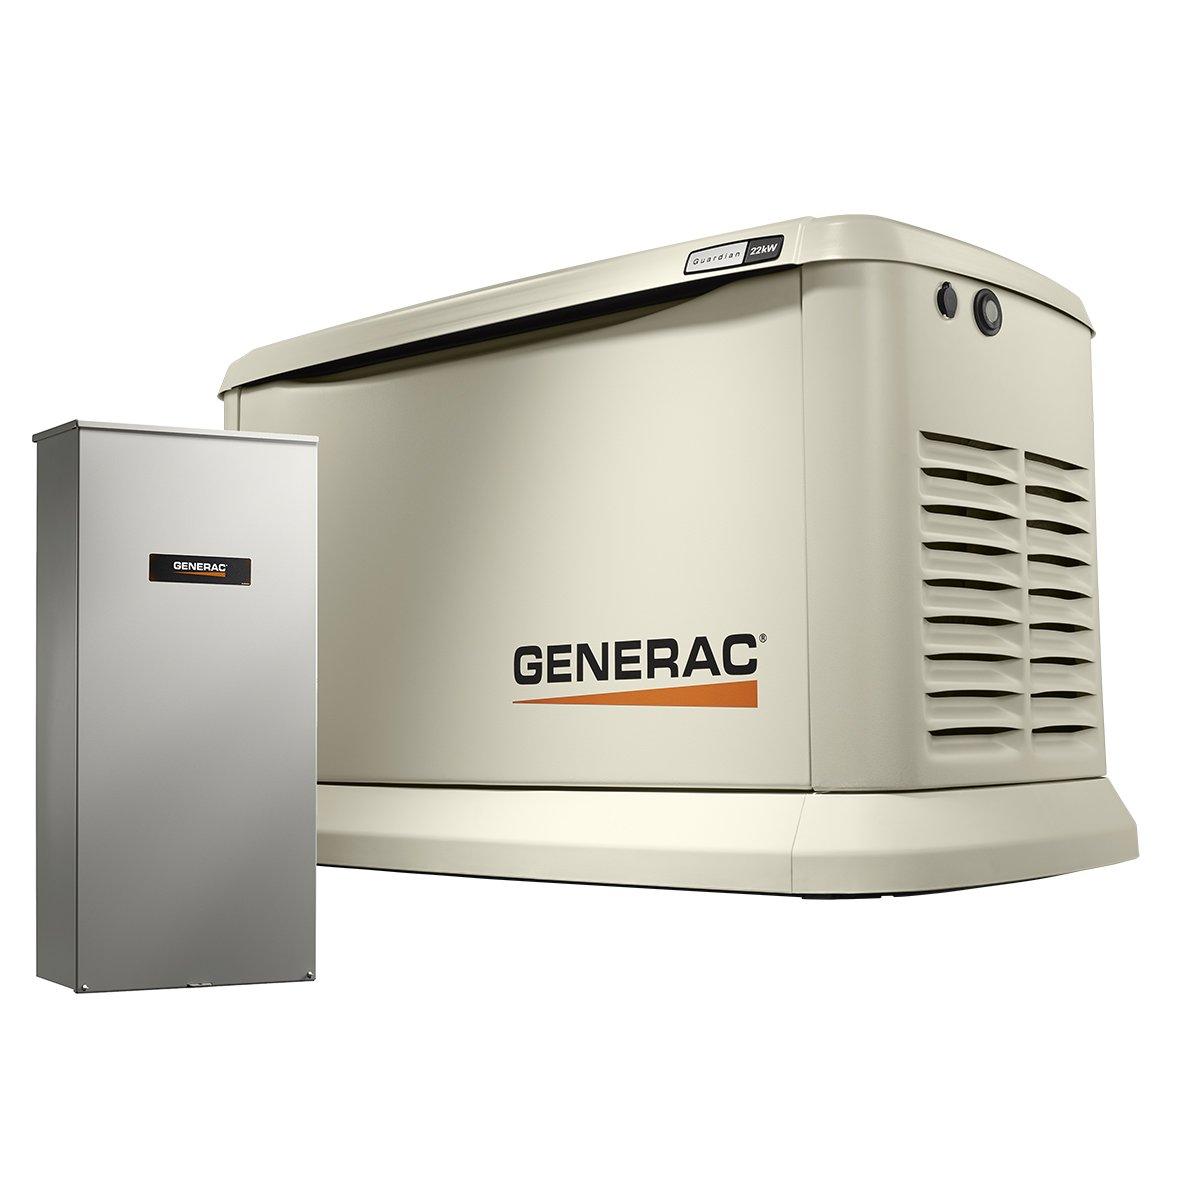 JPE Electrical generac generators